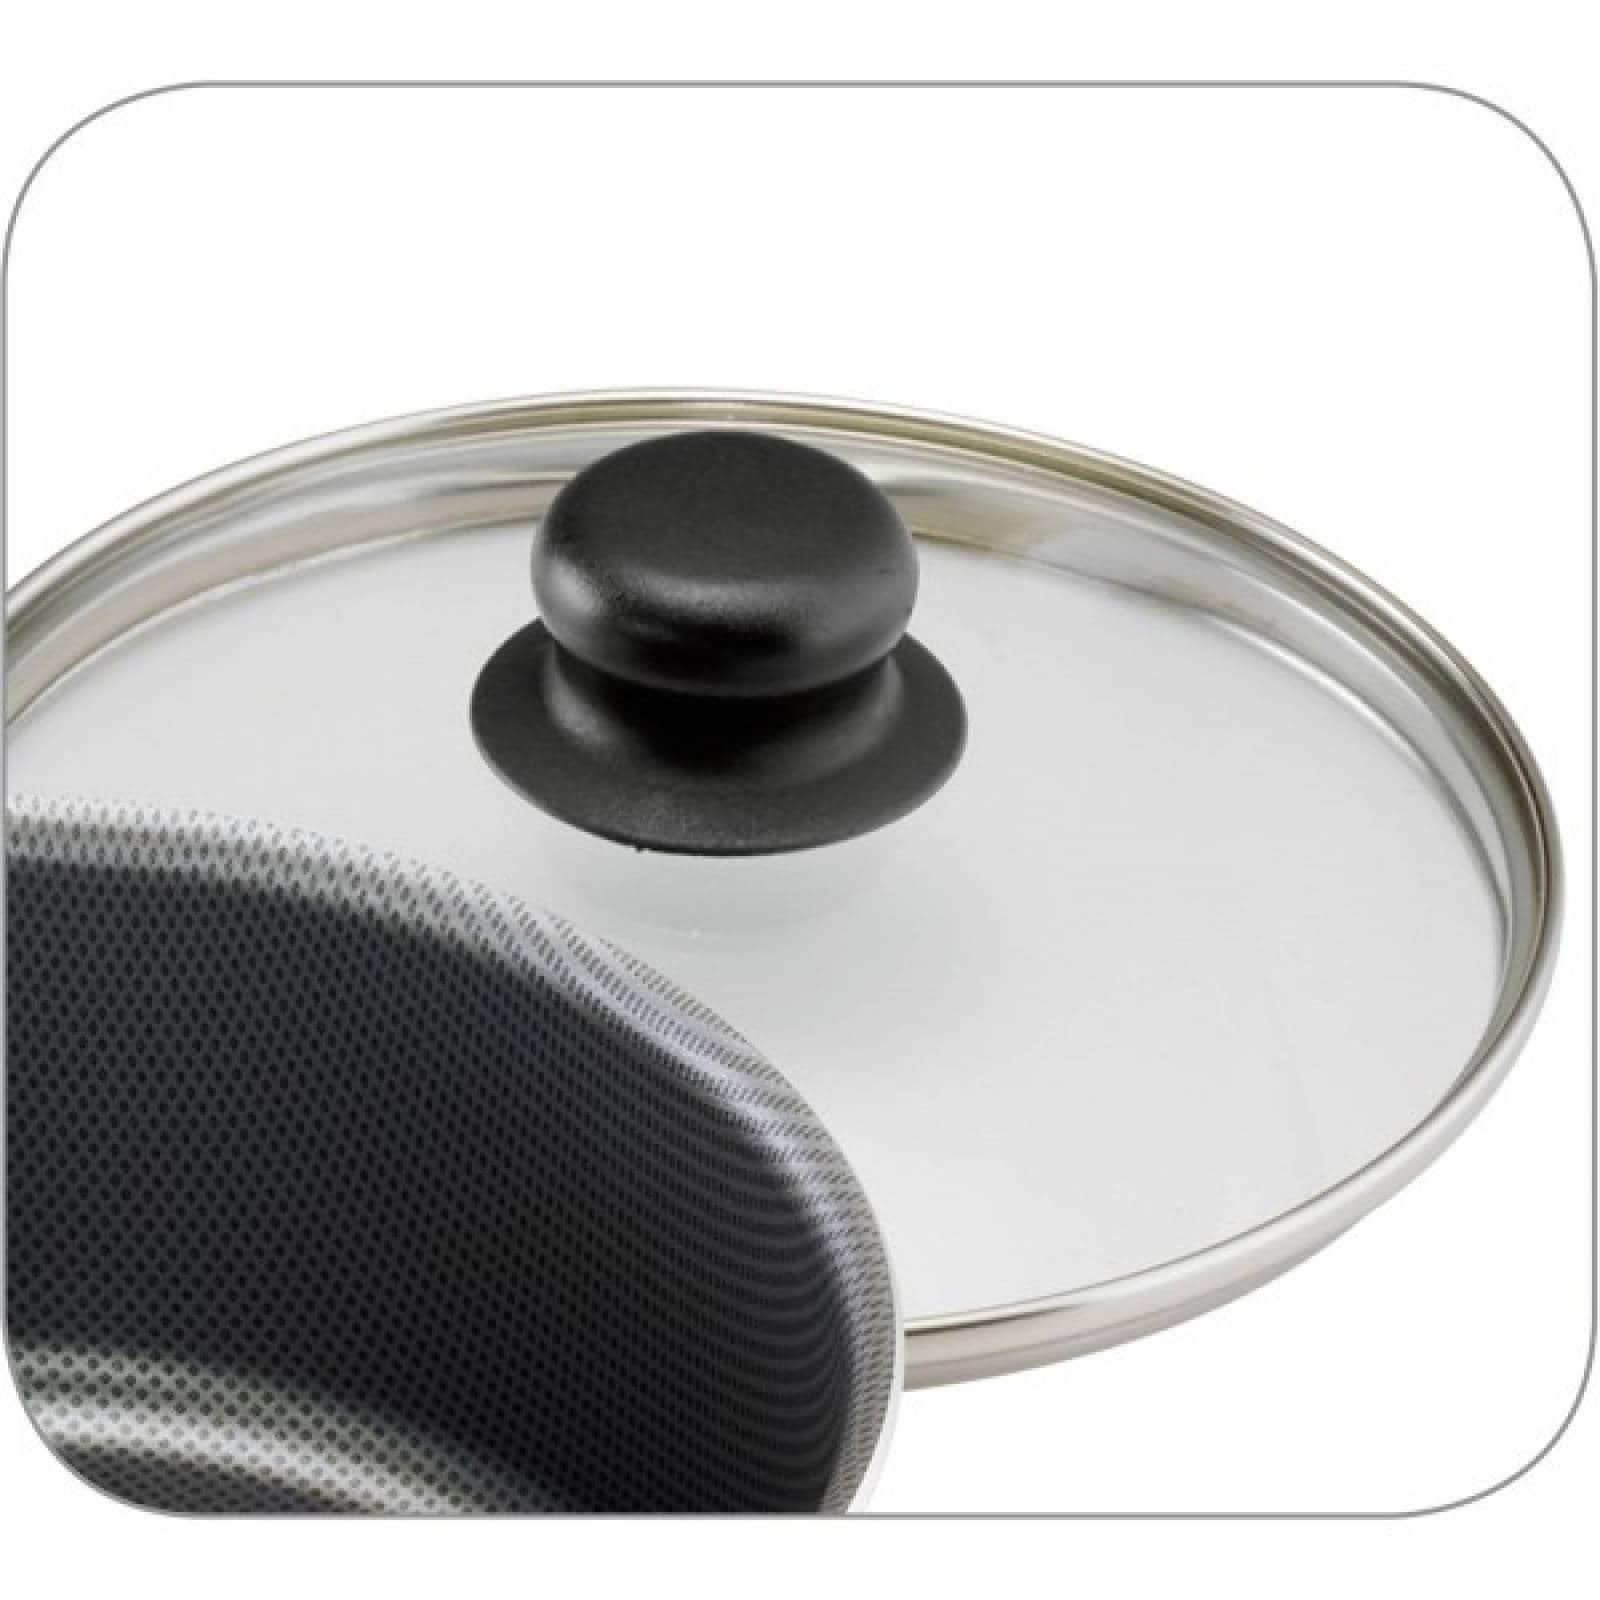 Batería De Cocina Primaware 18 Pcs Negra Aluminio Tramontina